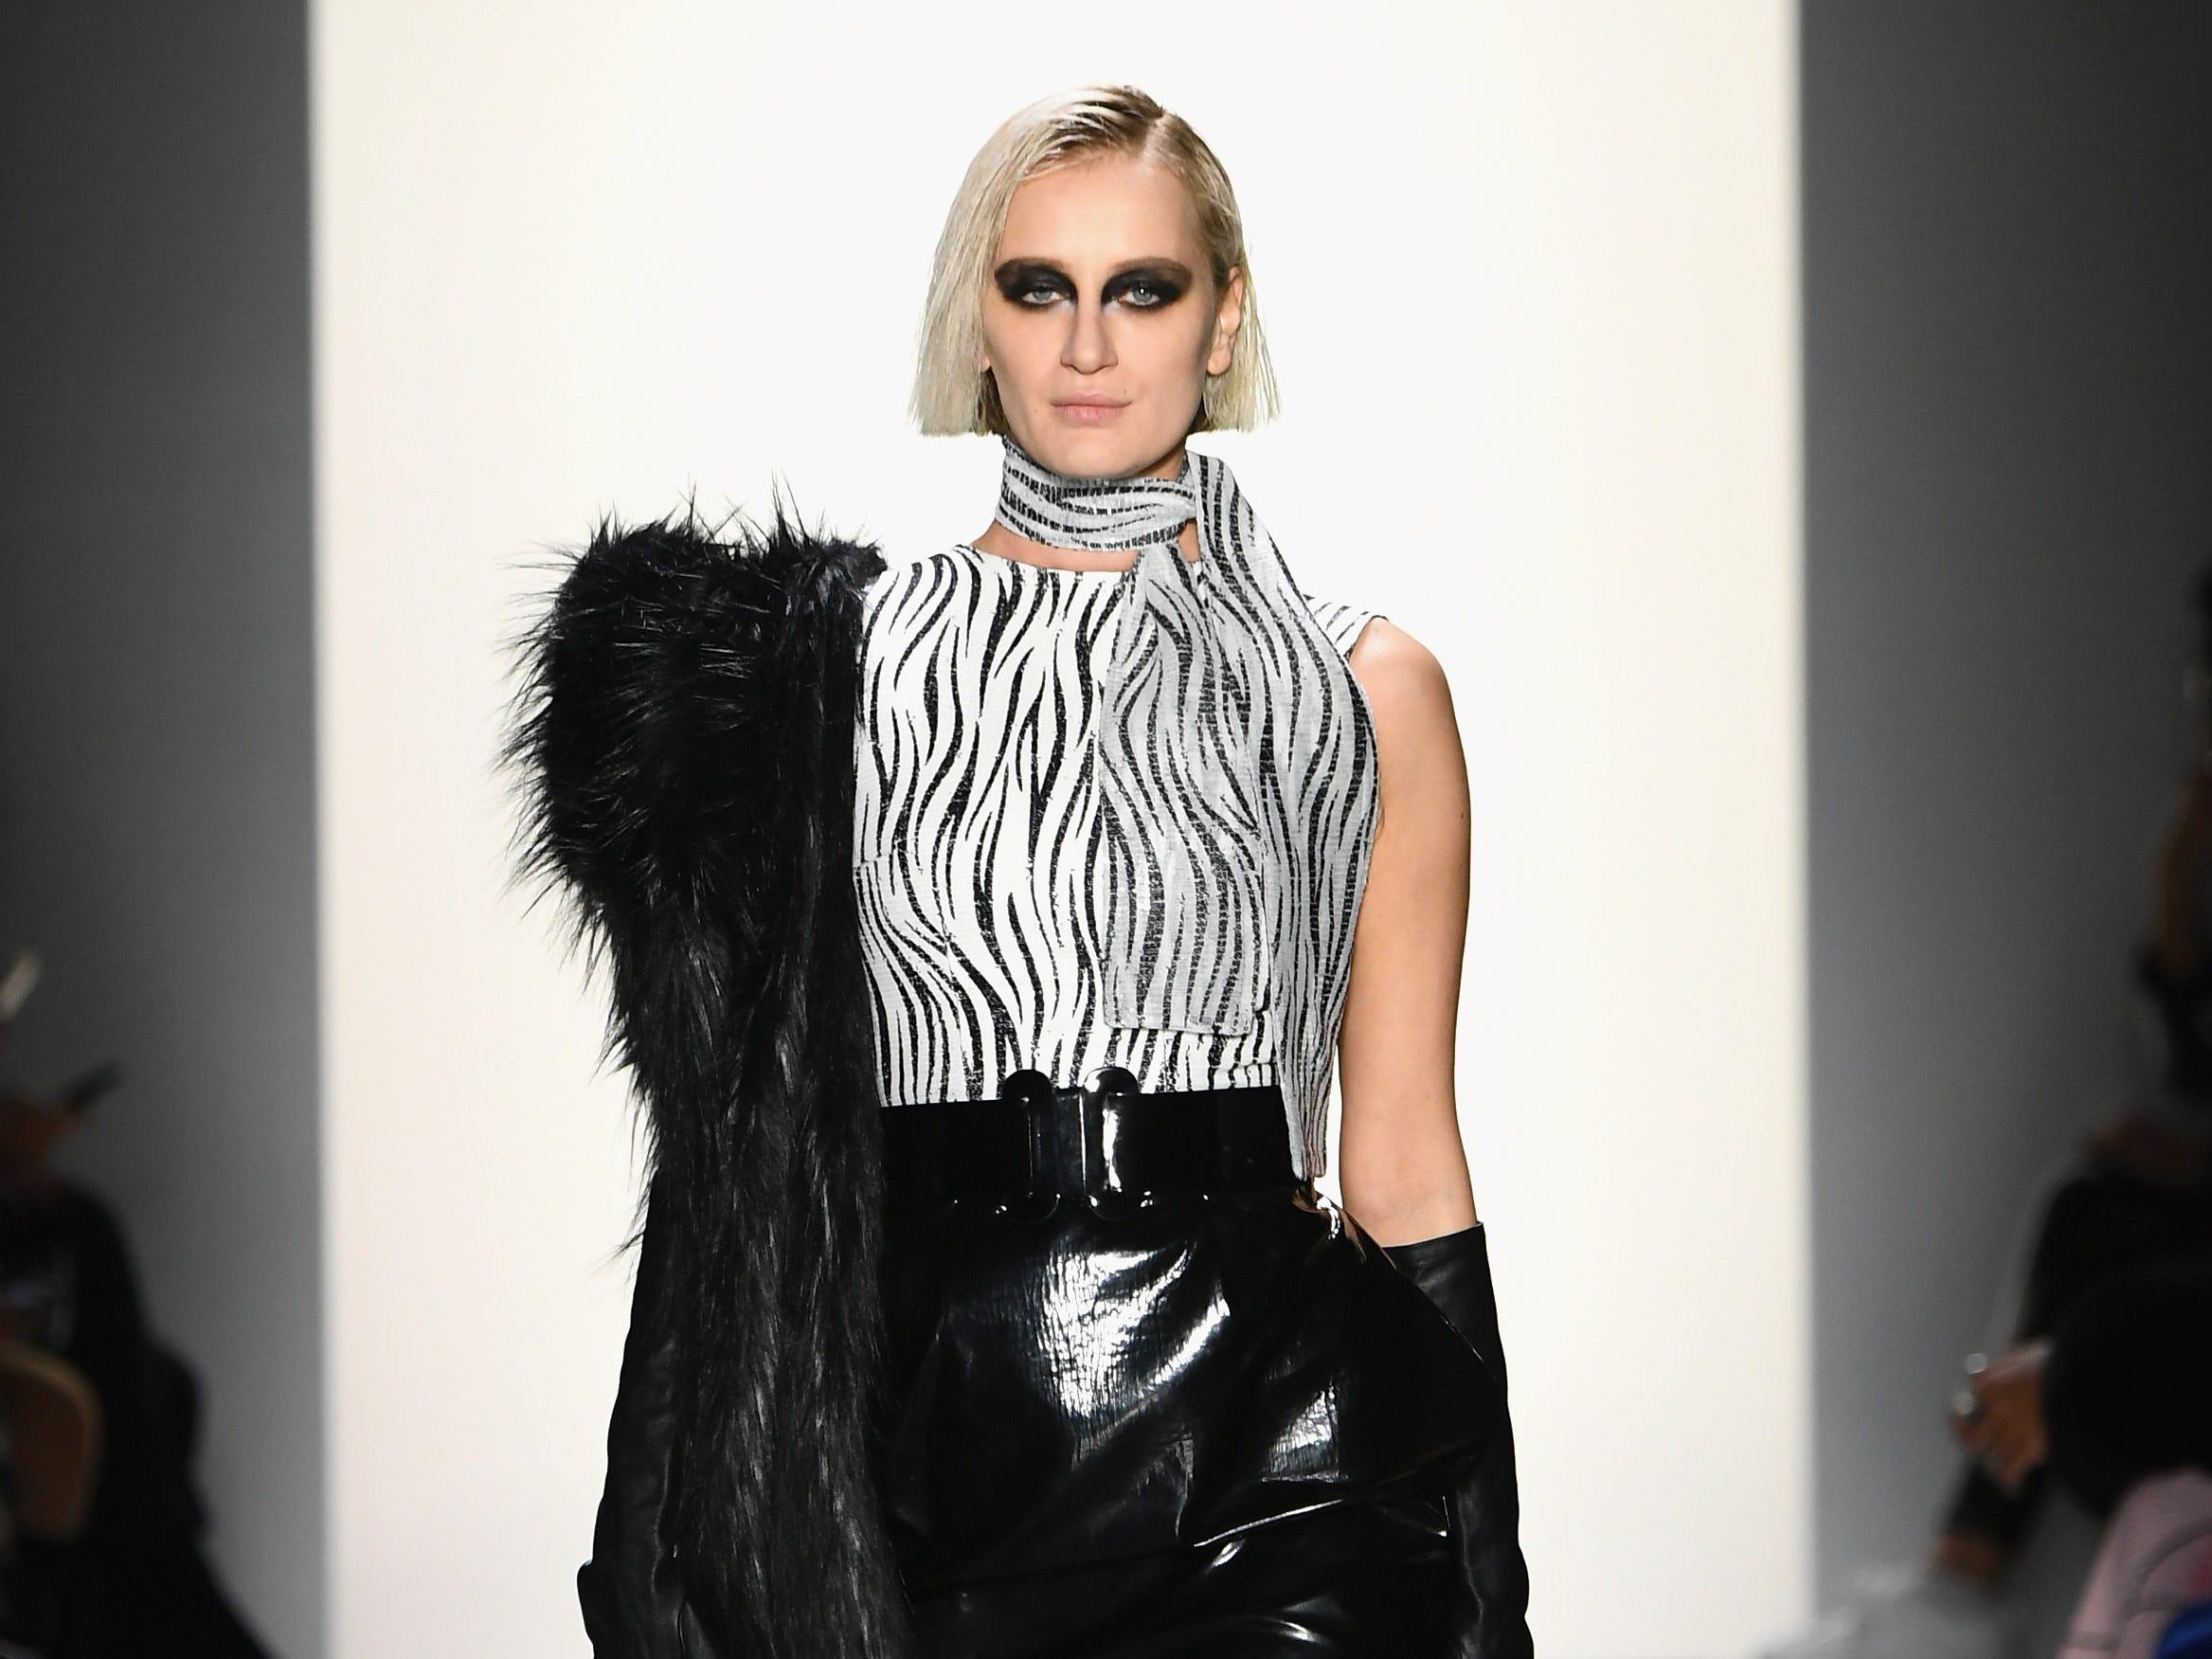 A model wears Hakan Akkaya's 2019 Fall designs as she makes her way down the runway.